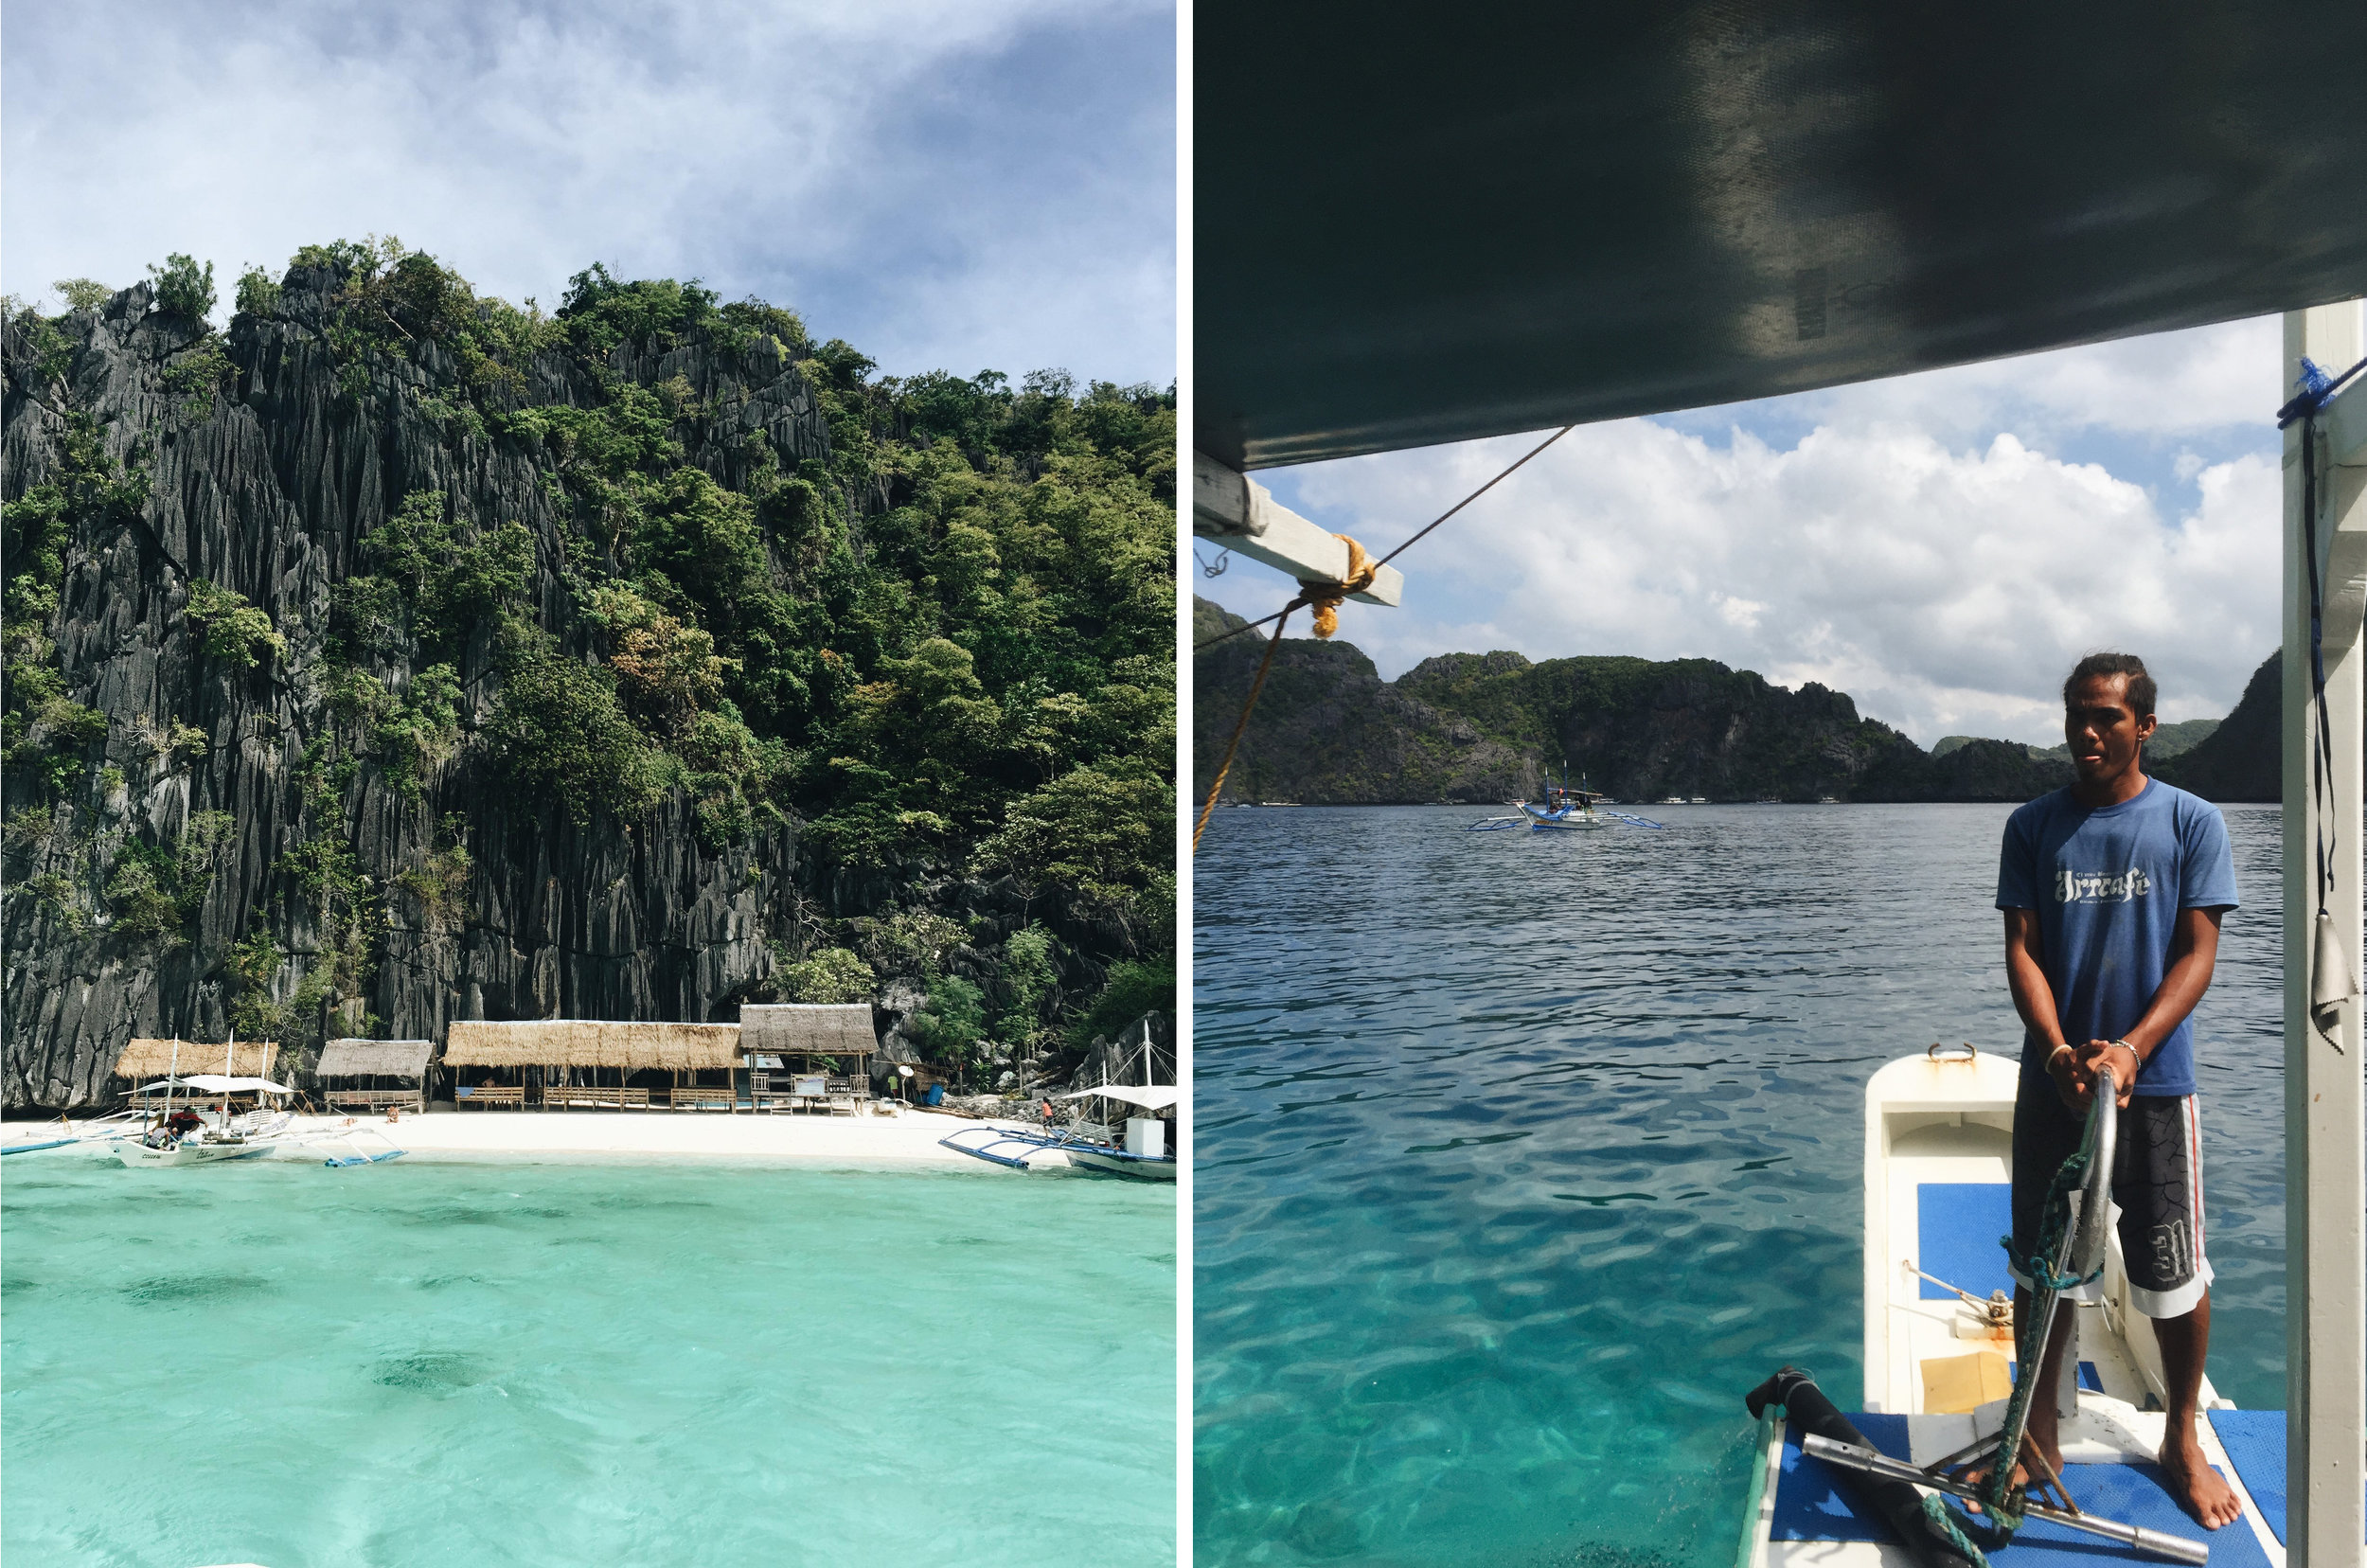 coron-palawan-philippines-island-hopping-el-nido.jpg